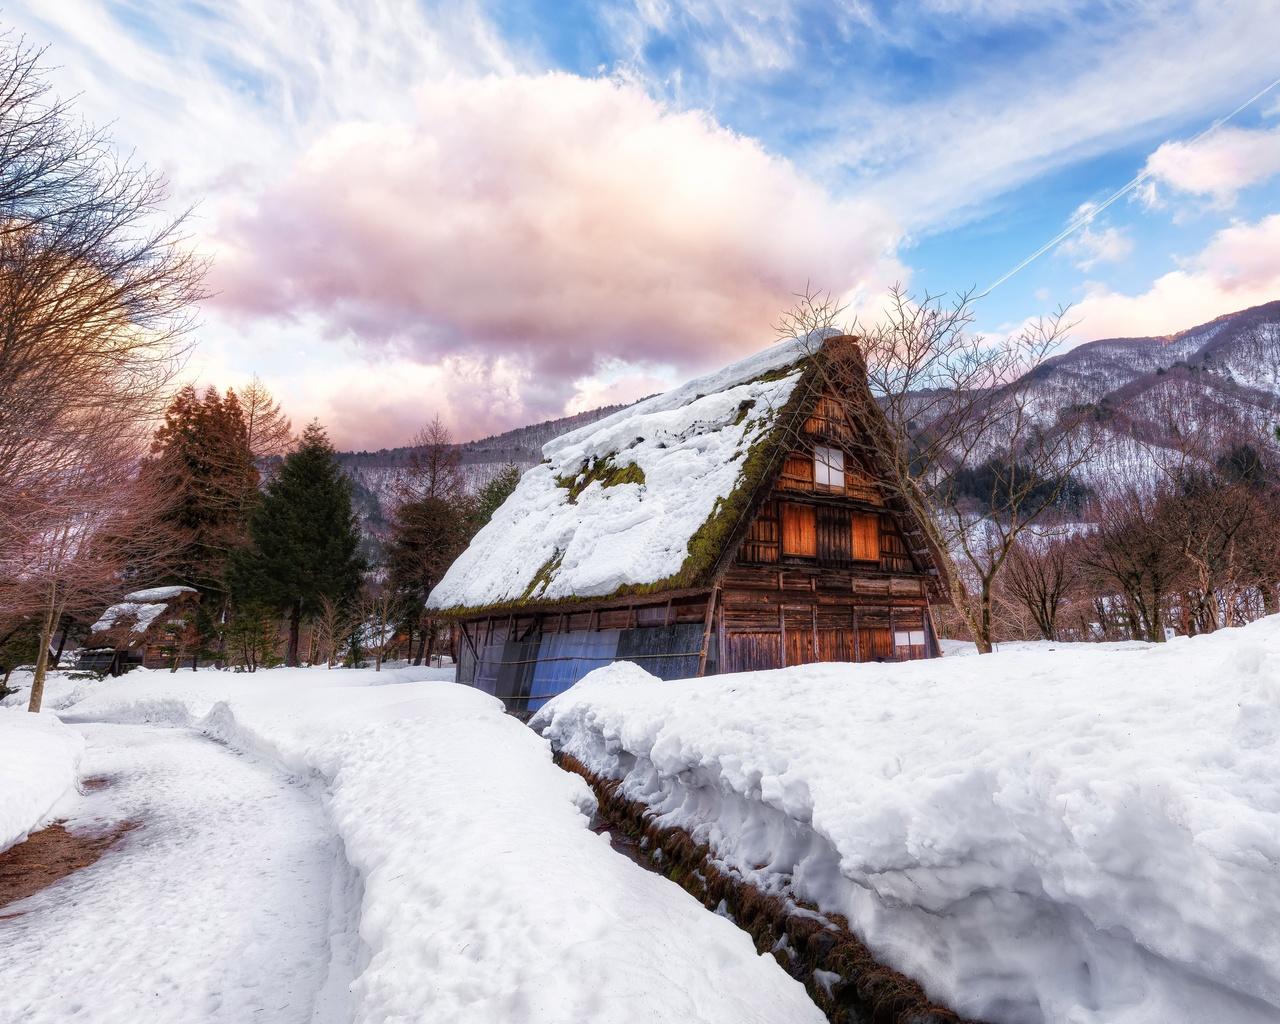 зима, снег, природа, сугробы, домики